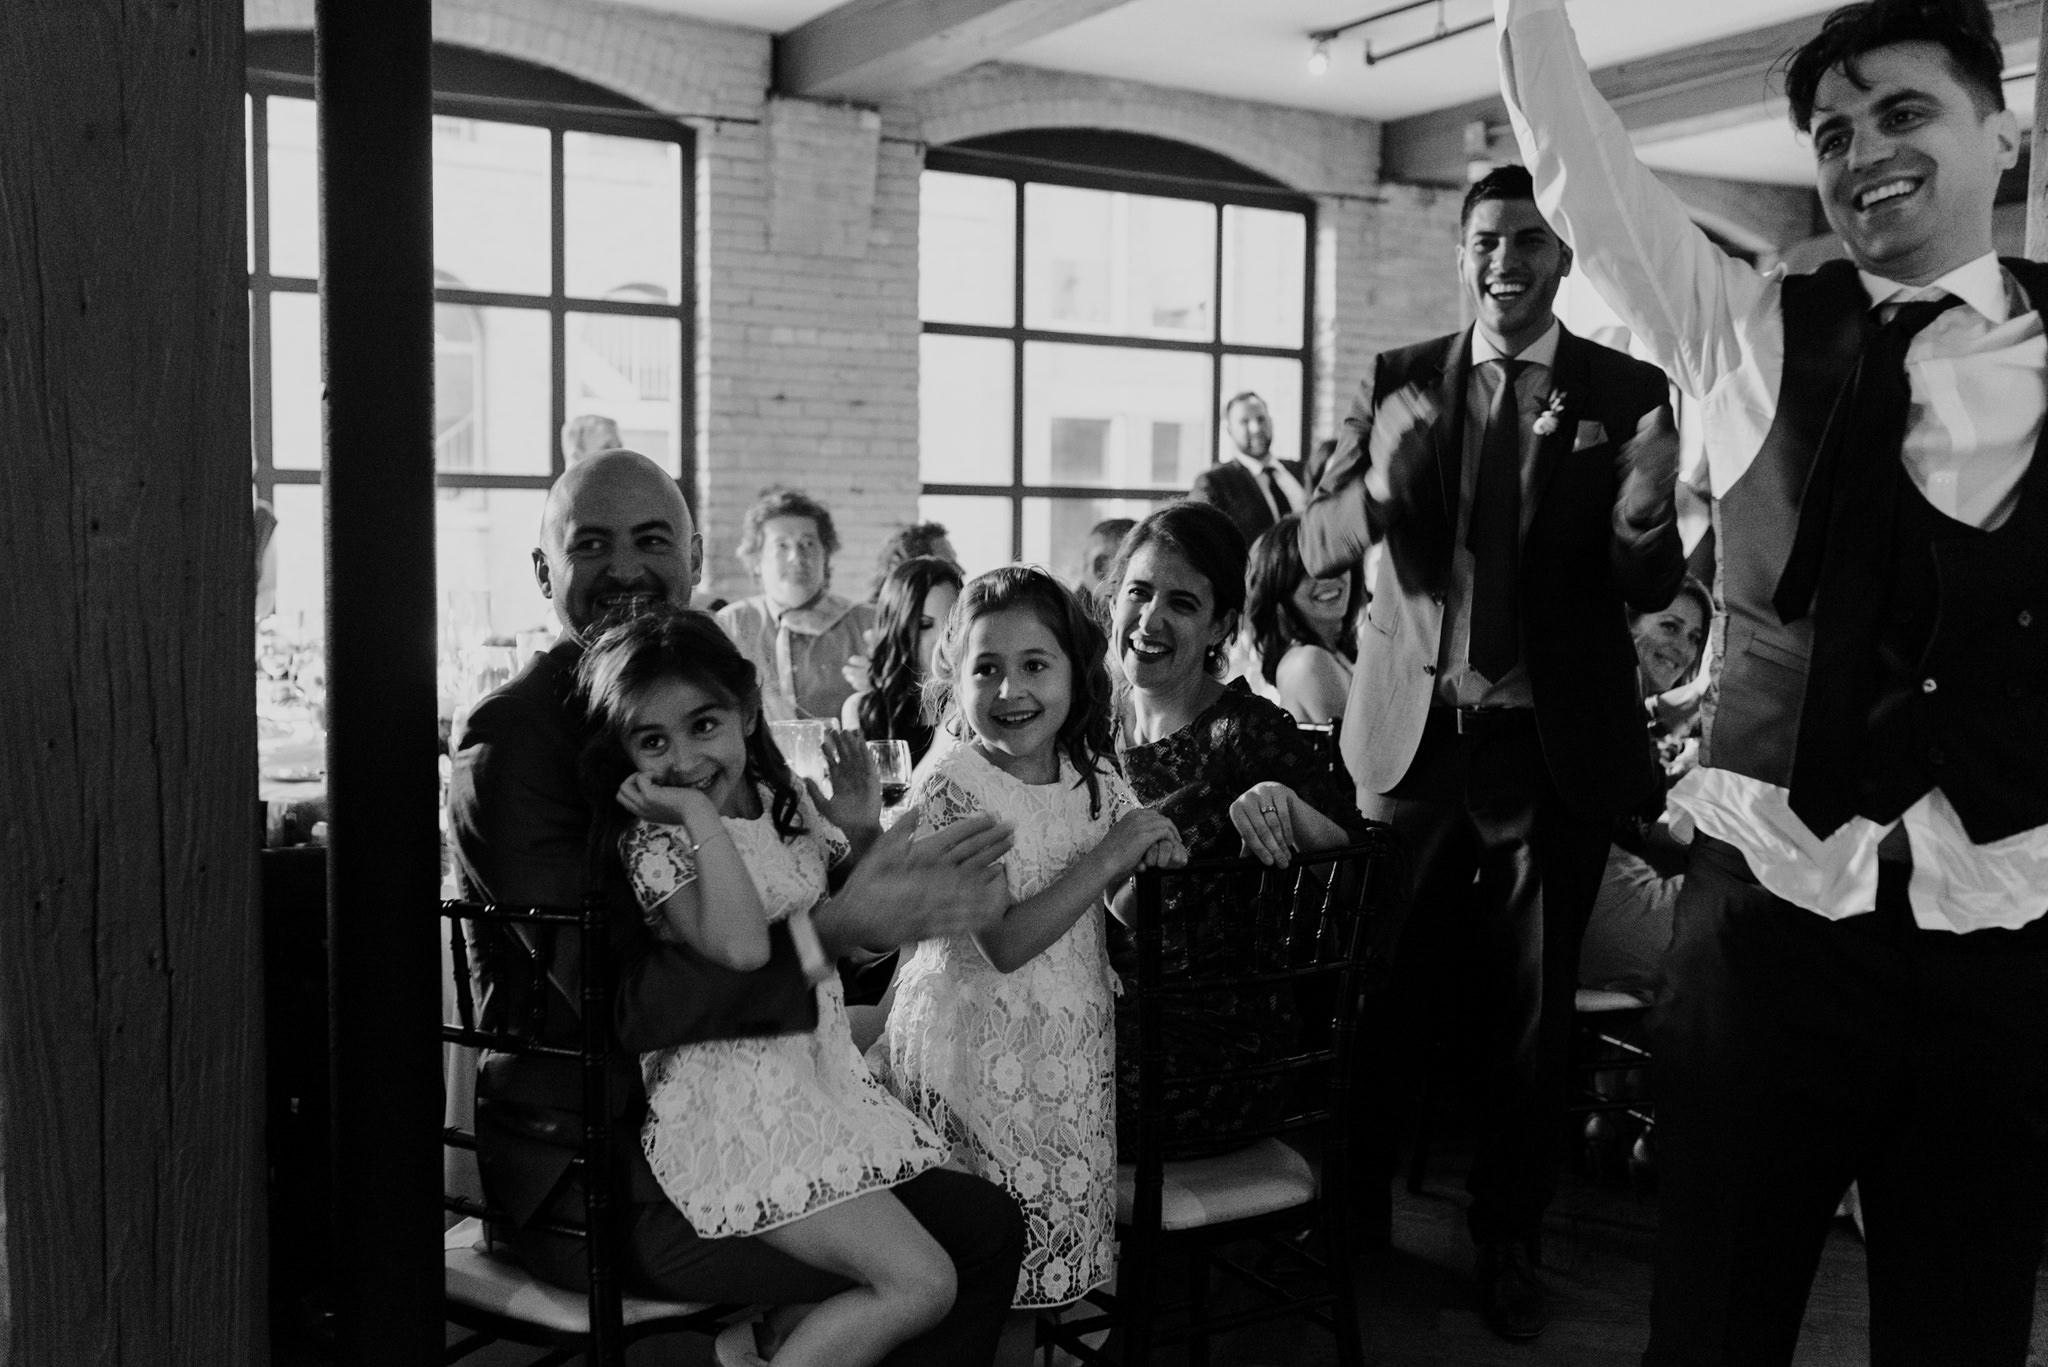 061-guests-candids-documentary-wedding-photographer-reception-storys-toronto.jpg